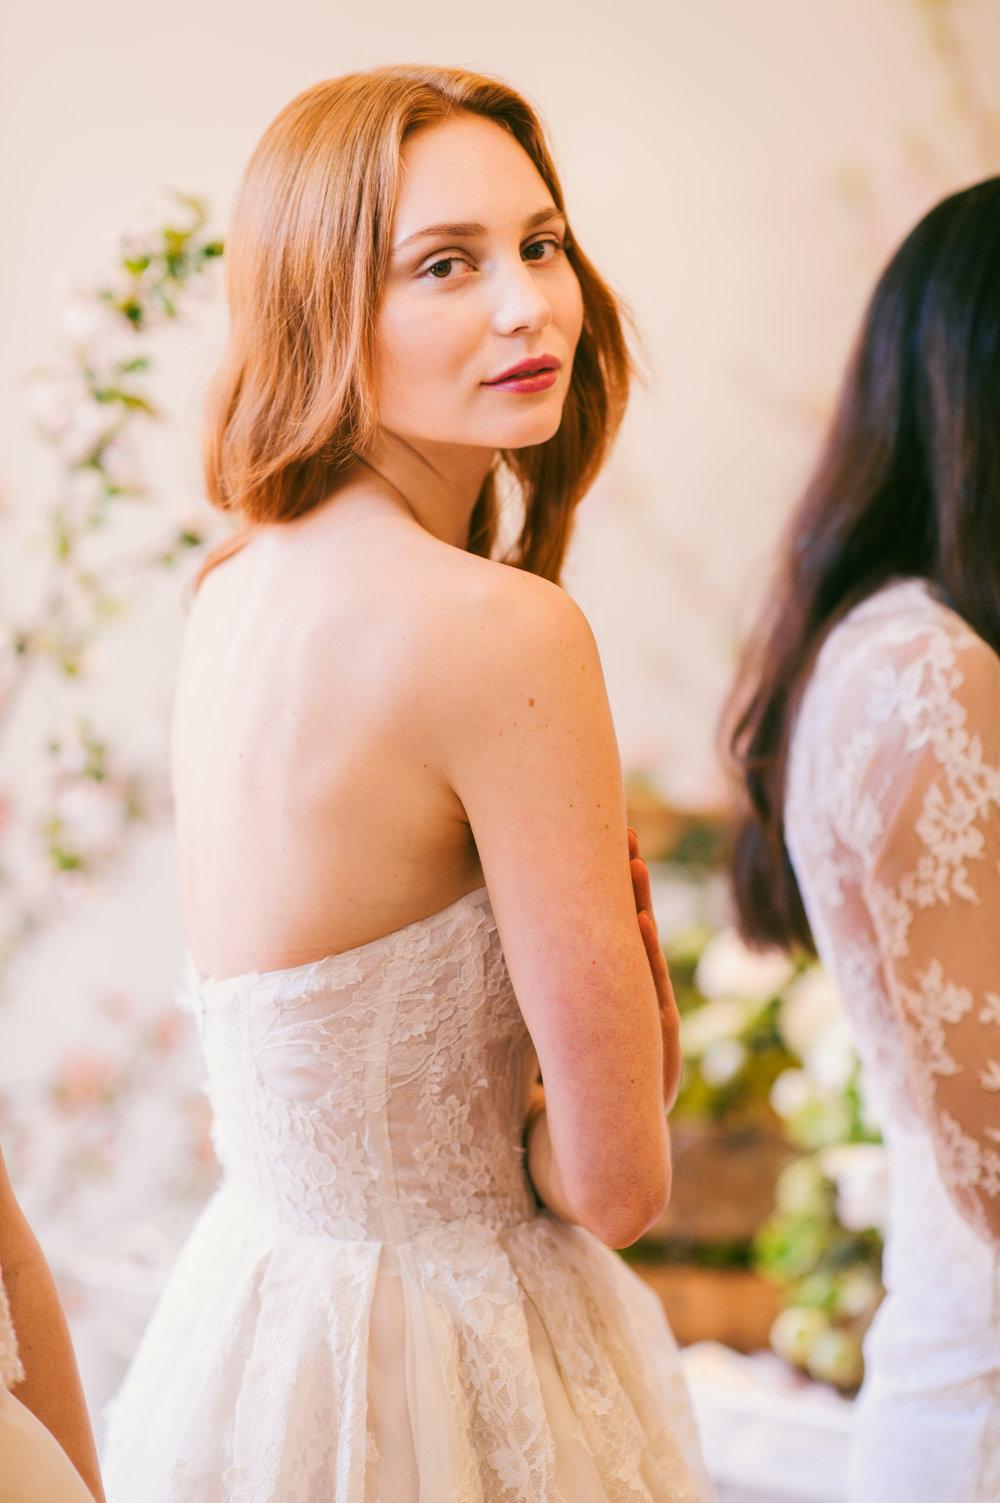 SarahSeven.Romantics.Bridal.107.jpg